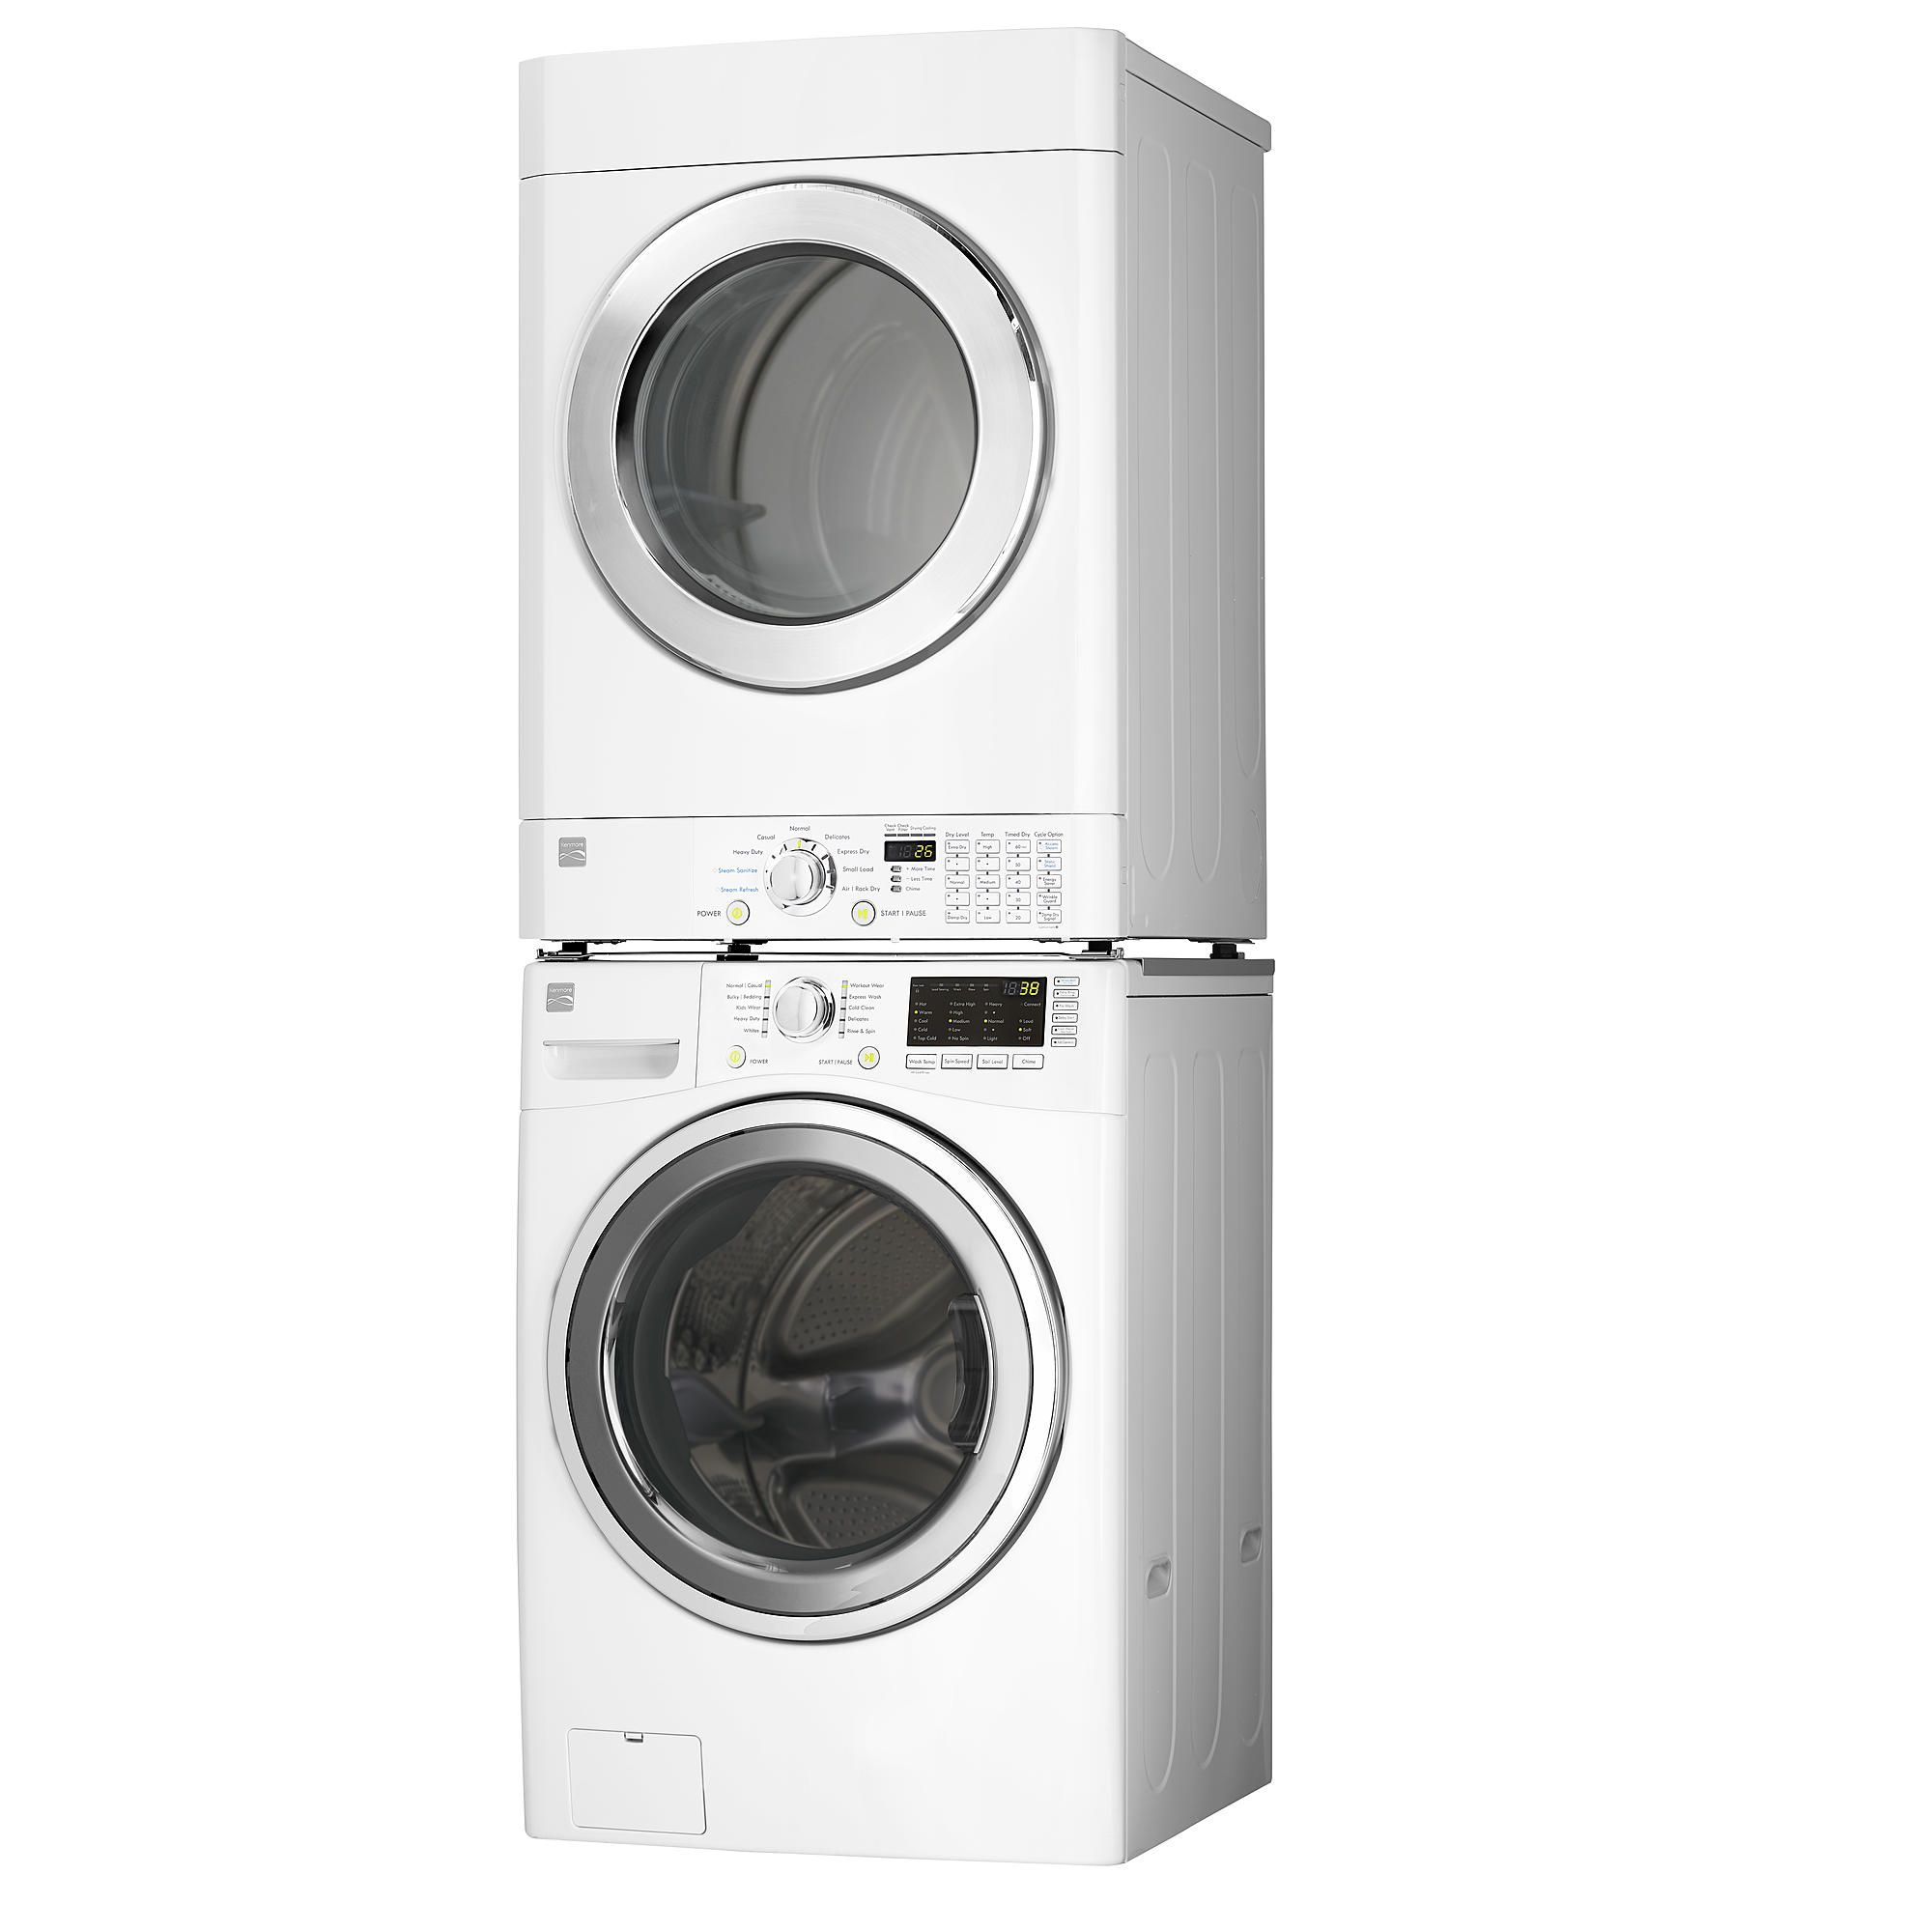 Kenmore 7 3 cu ft Front Load Flip Control Electric Dryer